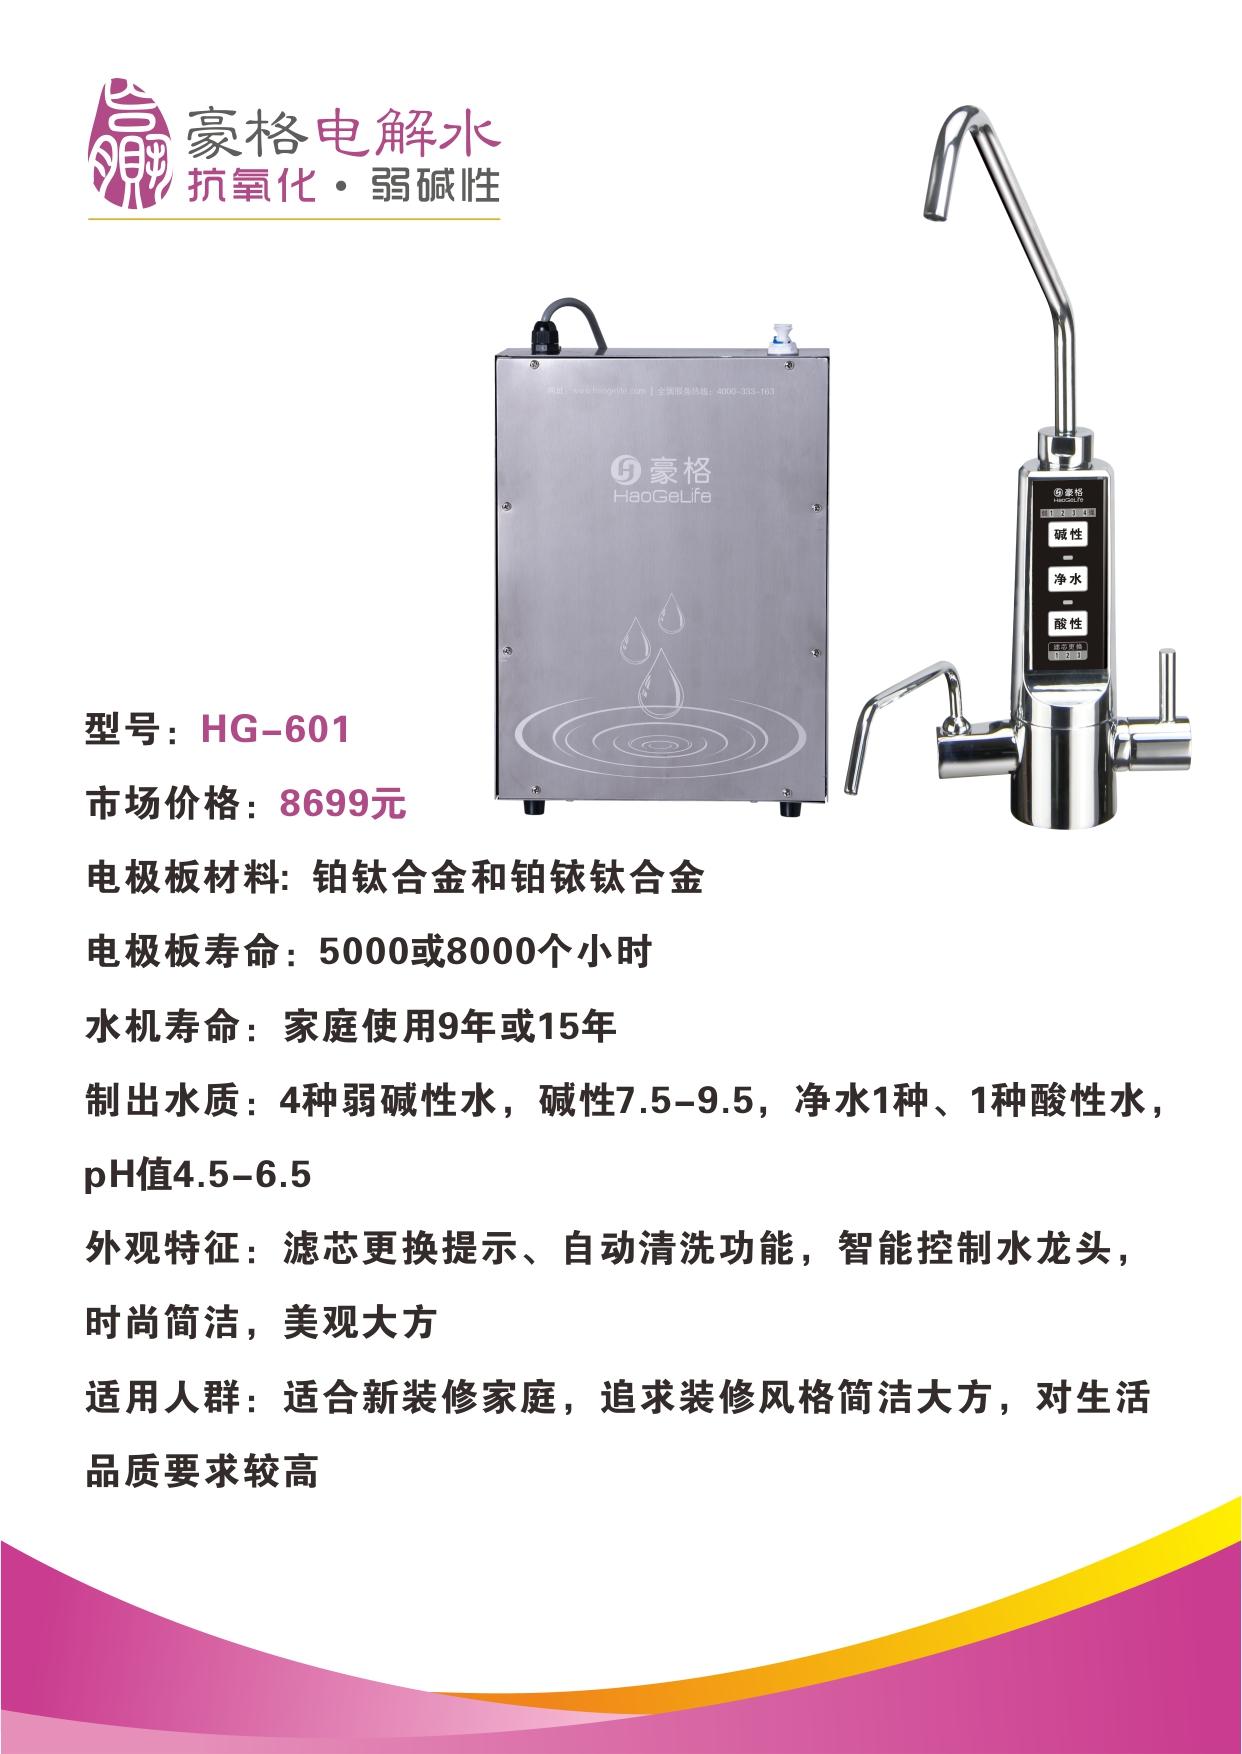 HG-601.jpg